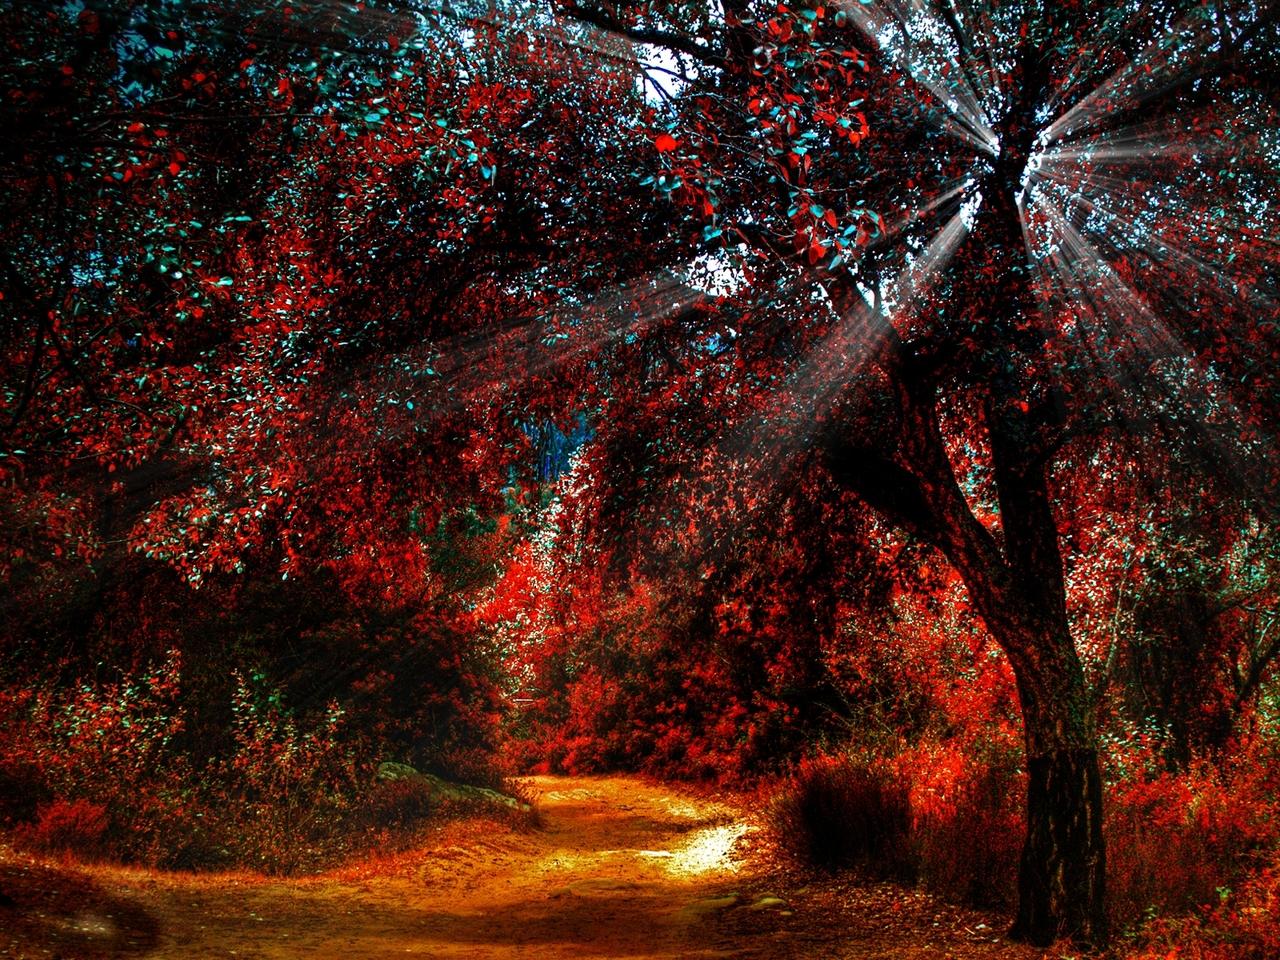 Tumblr Backgrounds Fall Autumn leaves fall 1280x960